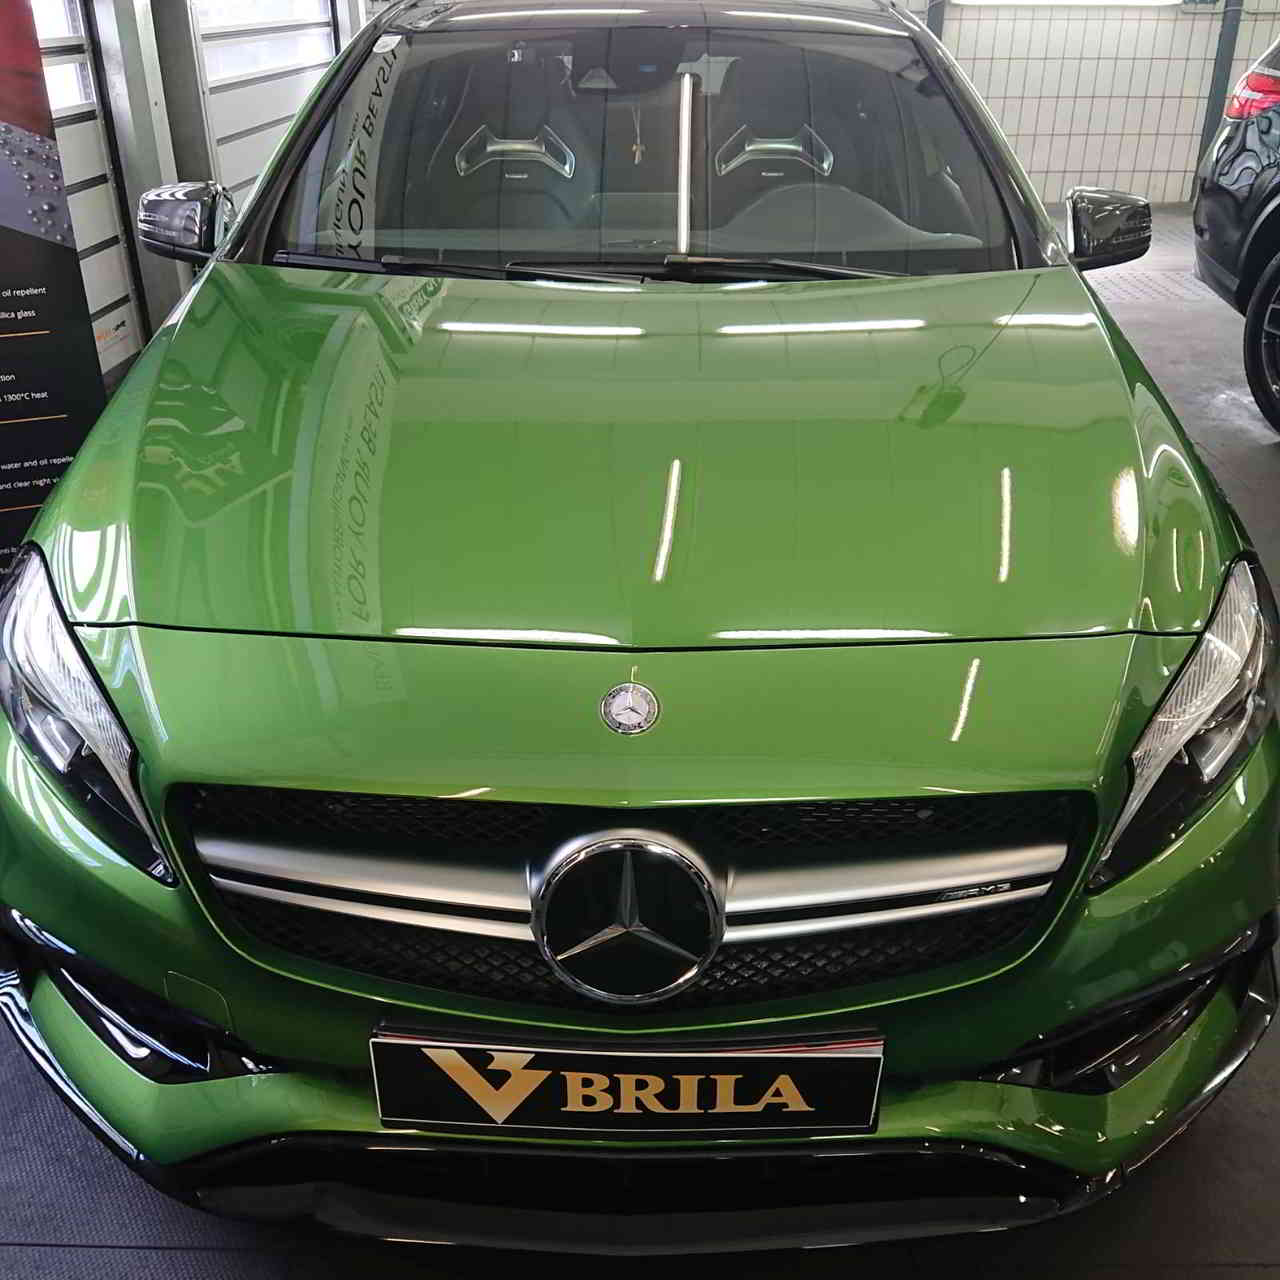 BRILA Wien Premium Body Coating AMG A45 Front